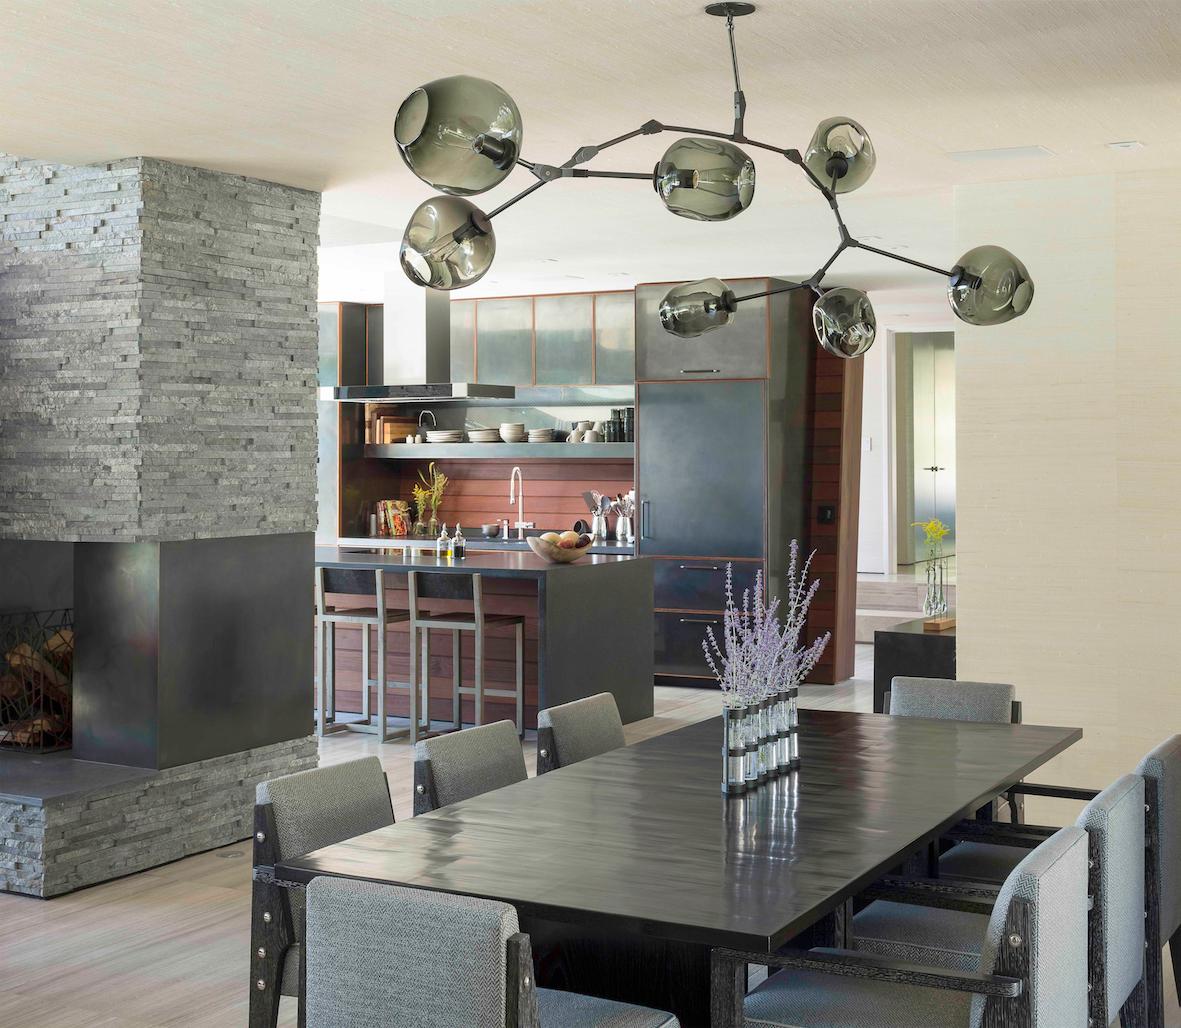 Dining Room, Table, Chair, Light Hardwood Floor, and Ceiling Lighting  Taghkanic House by Hariri & Hariri Architecture